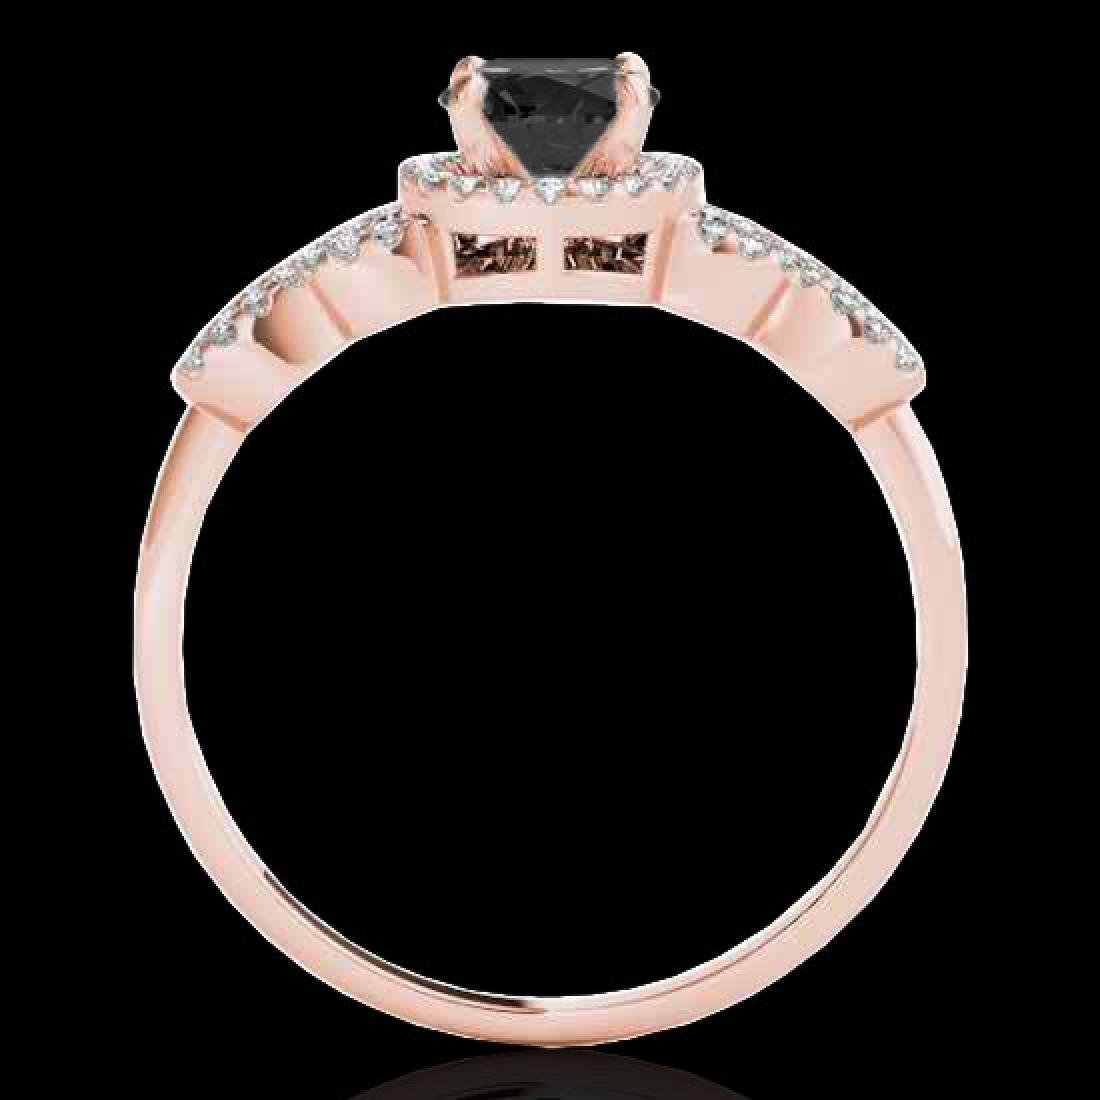 1.33 CTW Certified VS Black Diamond Solitaire Ring 10K - 2